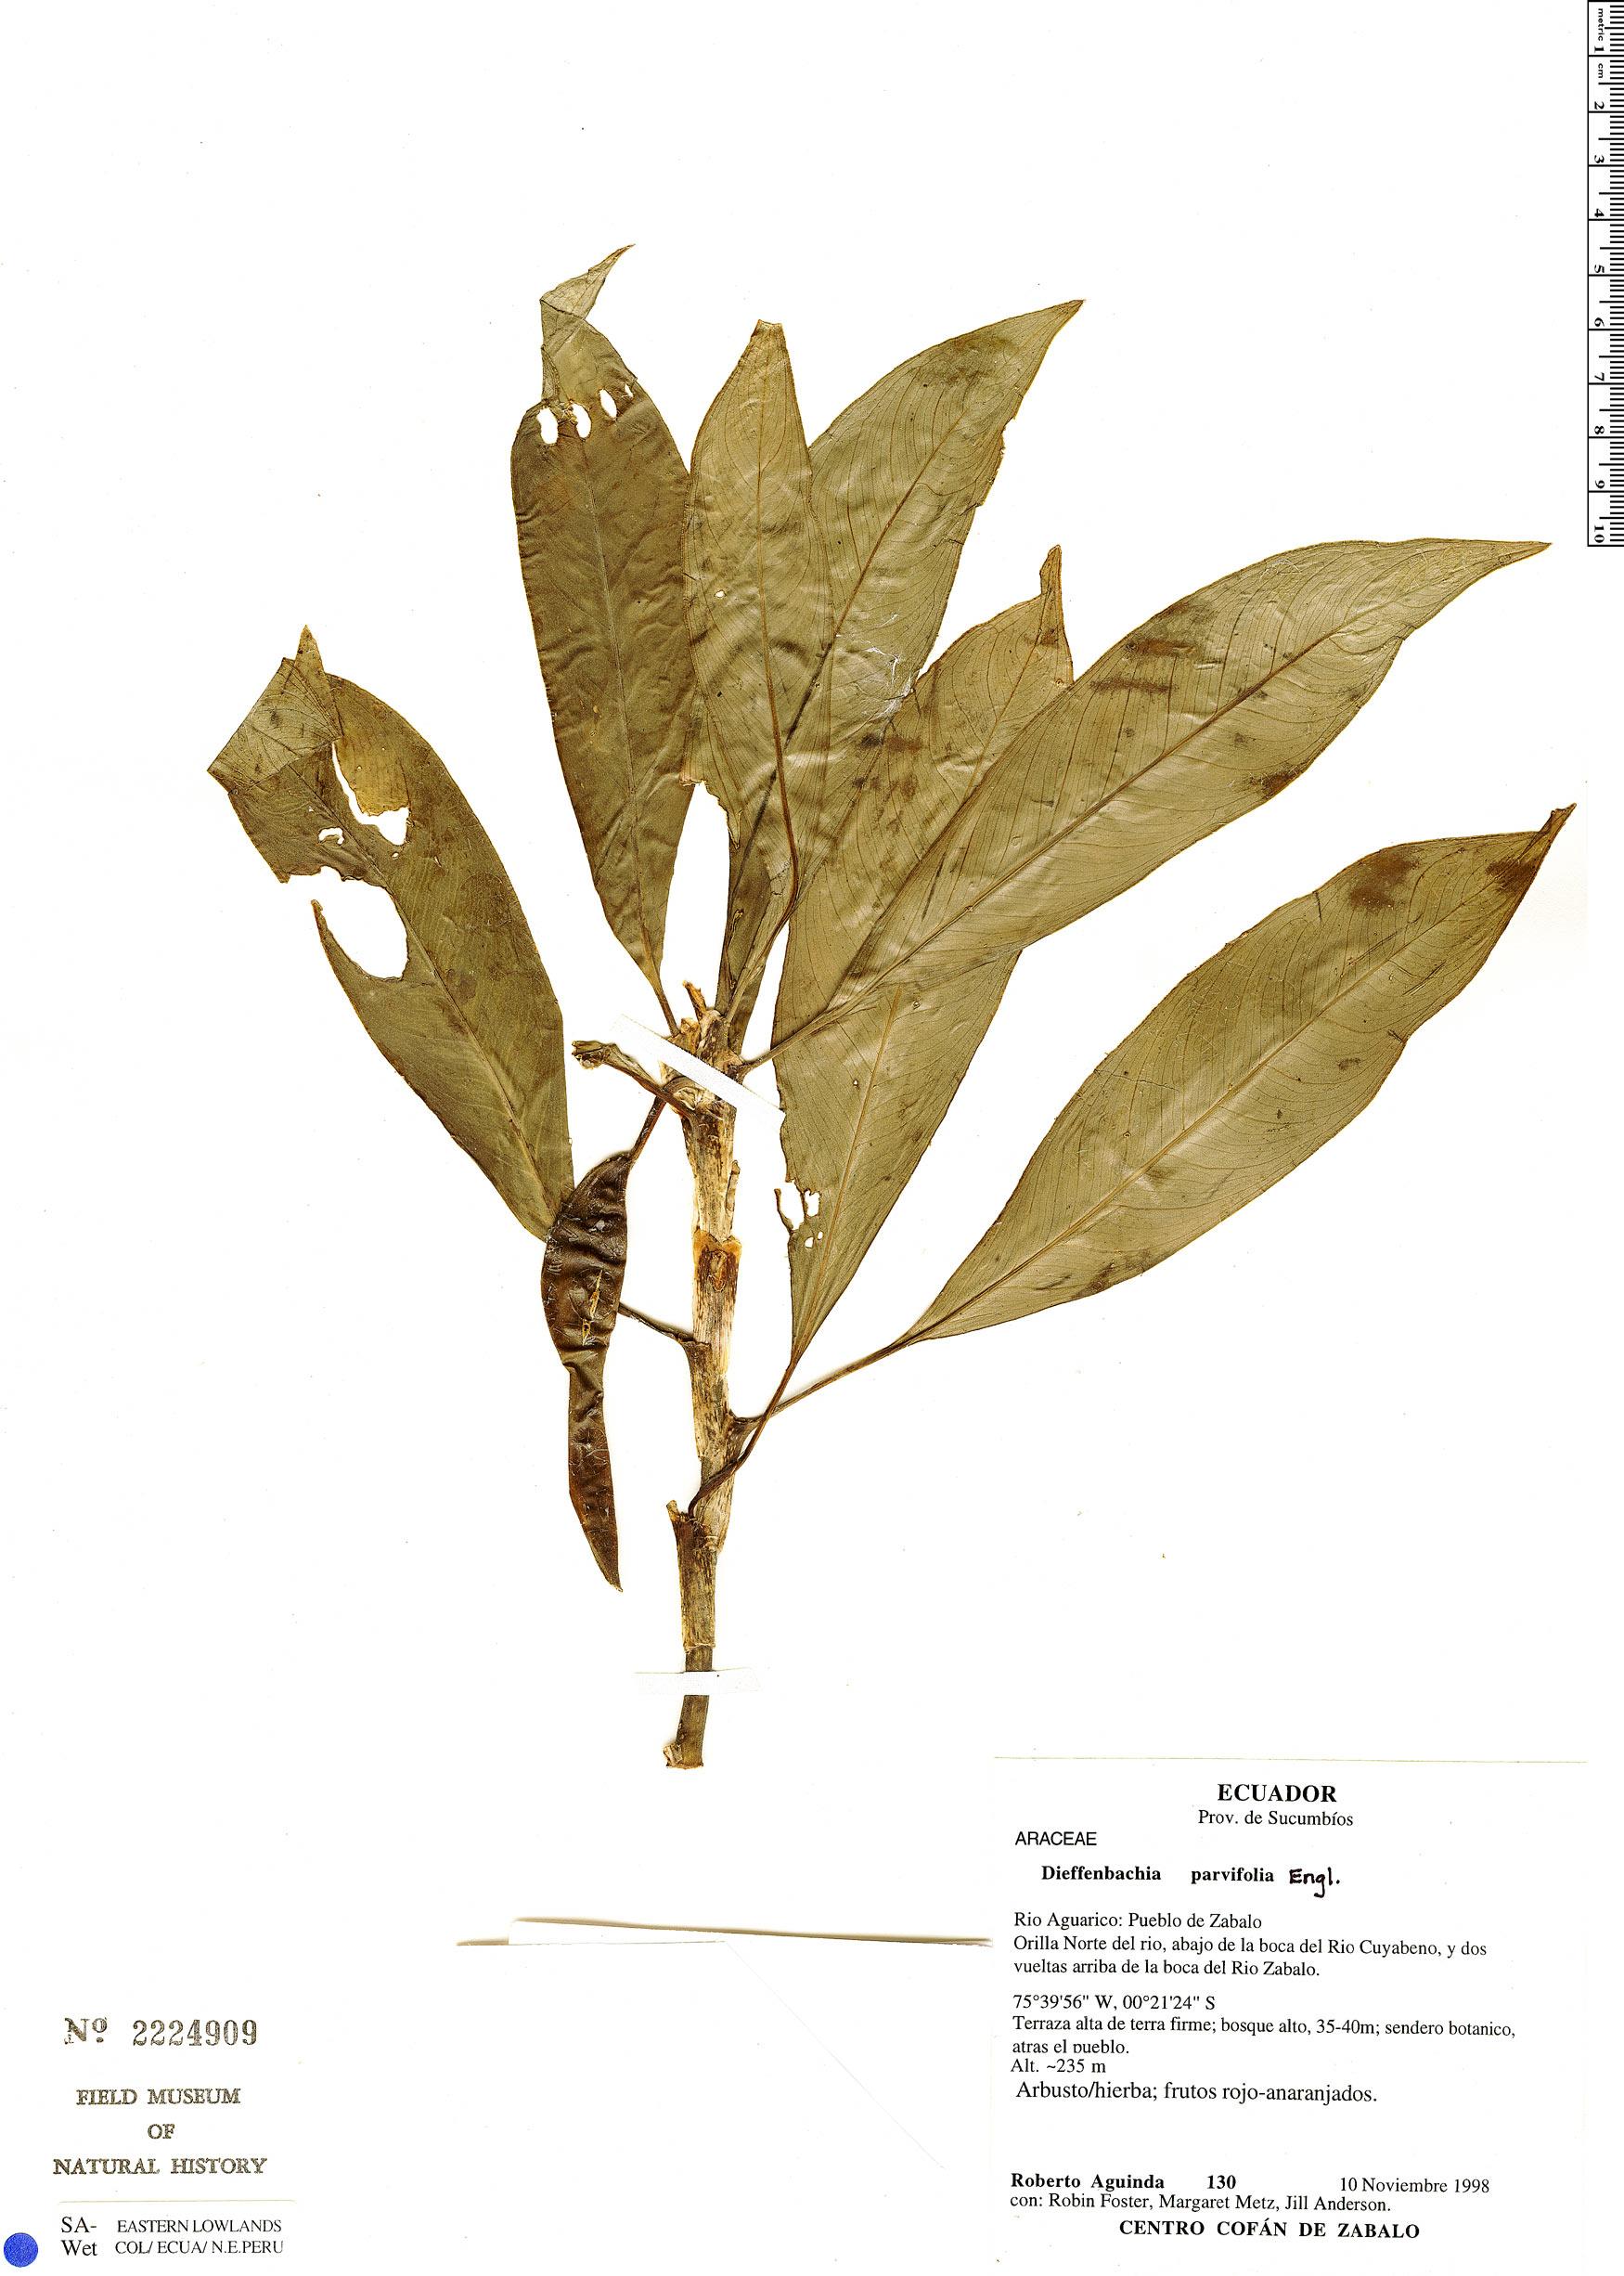 Specimen: Dieffenbachia parvifolia